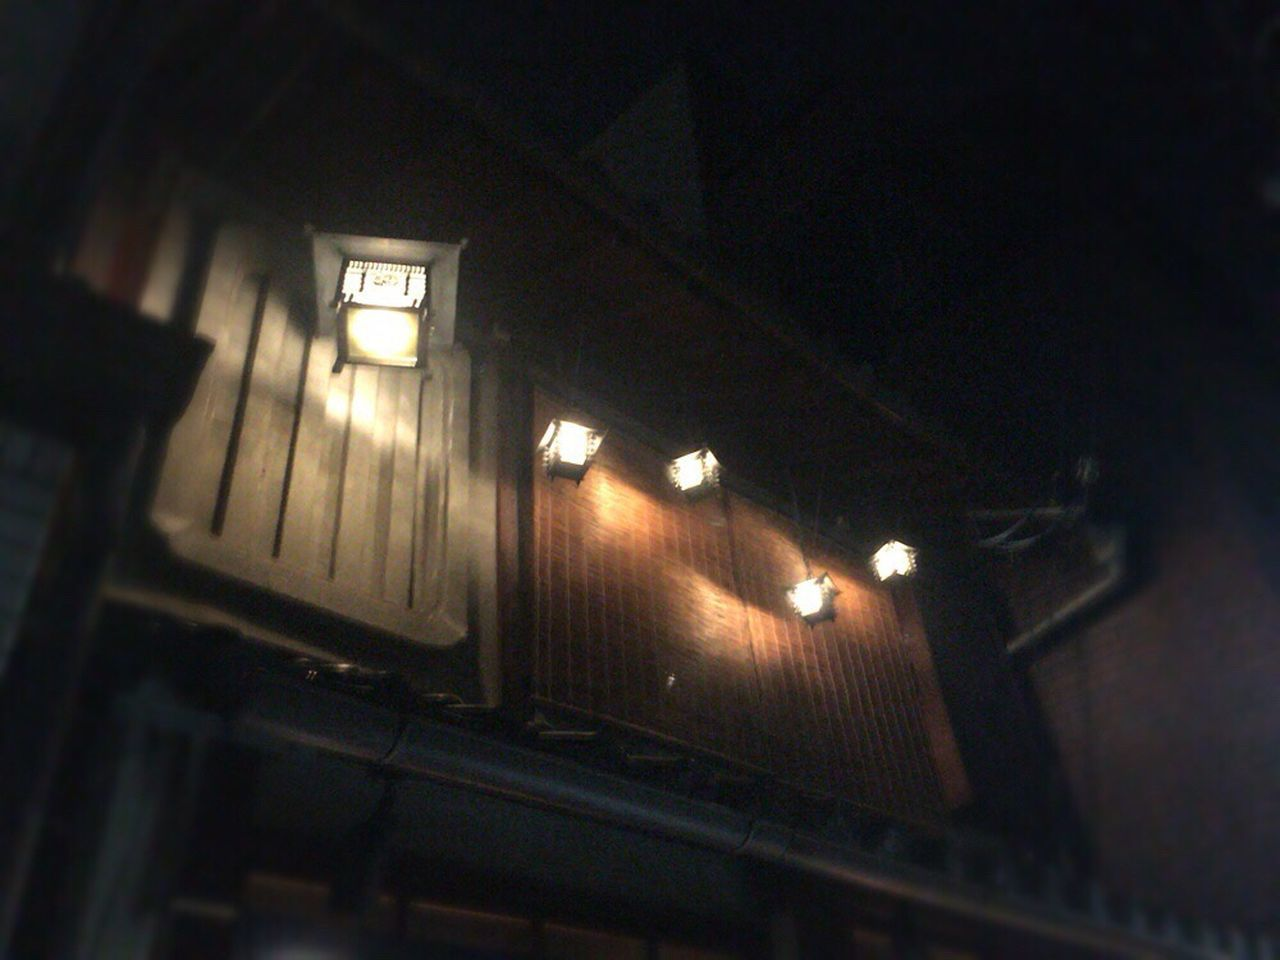 Kyoto,japan Kyoto Street Kyoto NIght Lights Kyoto Night Night Lights Kyoto Lamps Kyoto Matiya